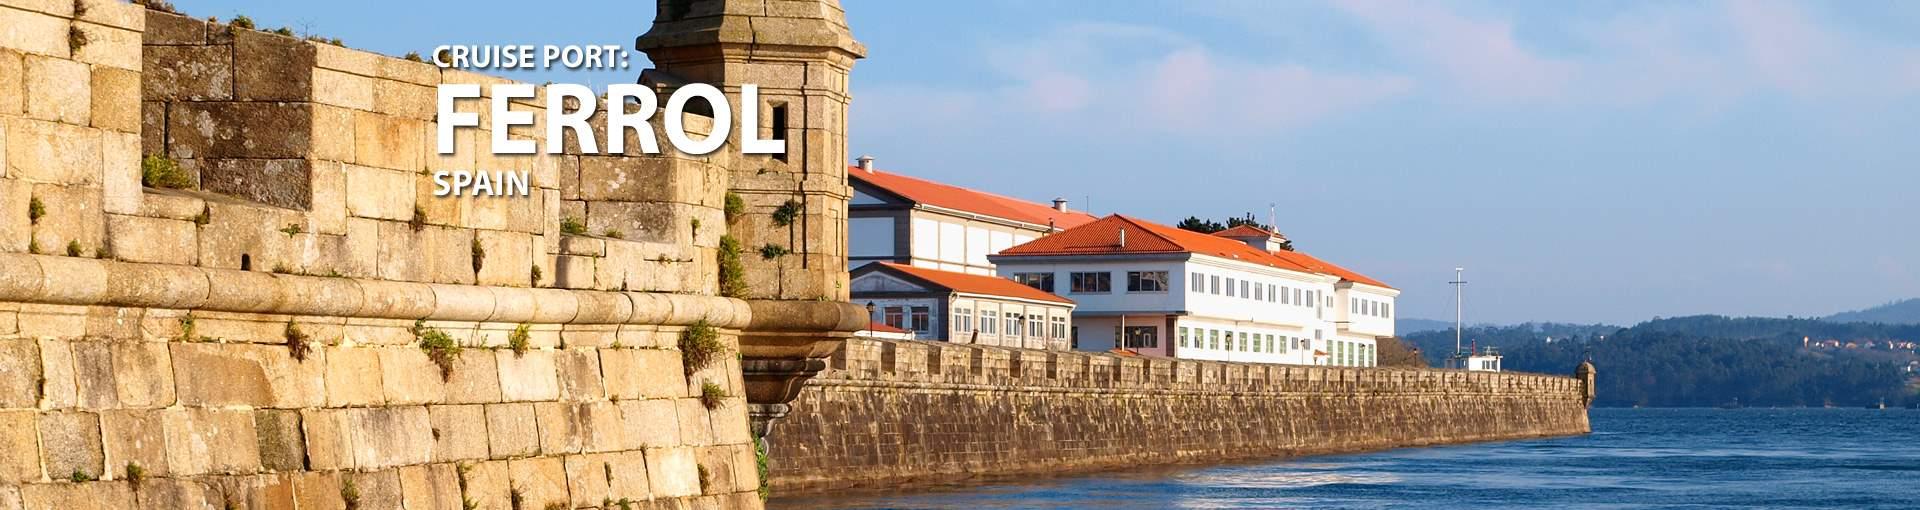 Cruises to Ferrol, Spain